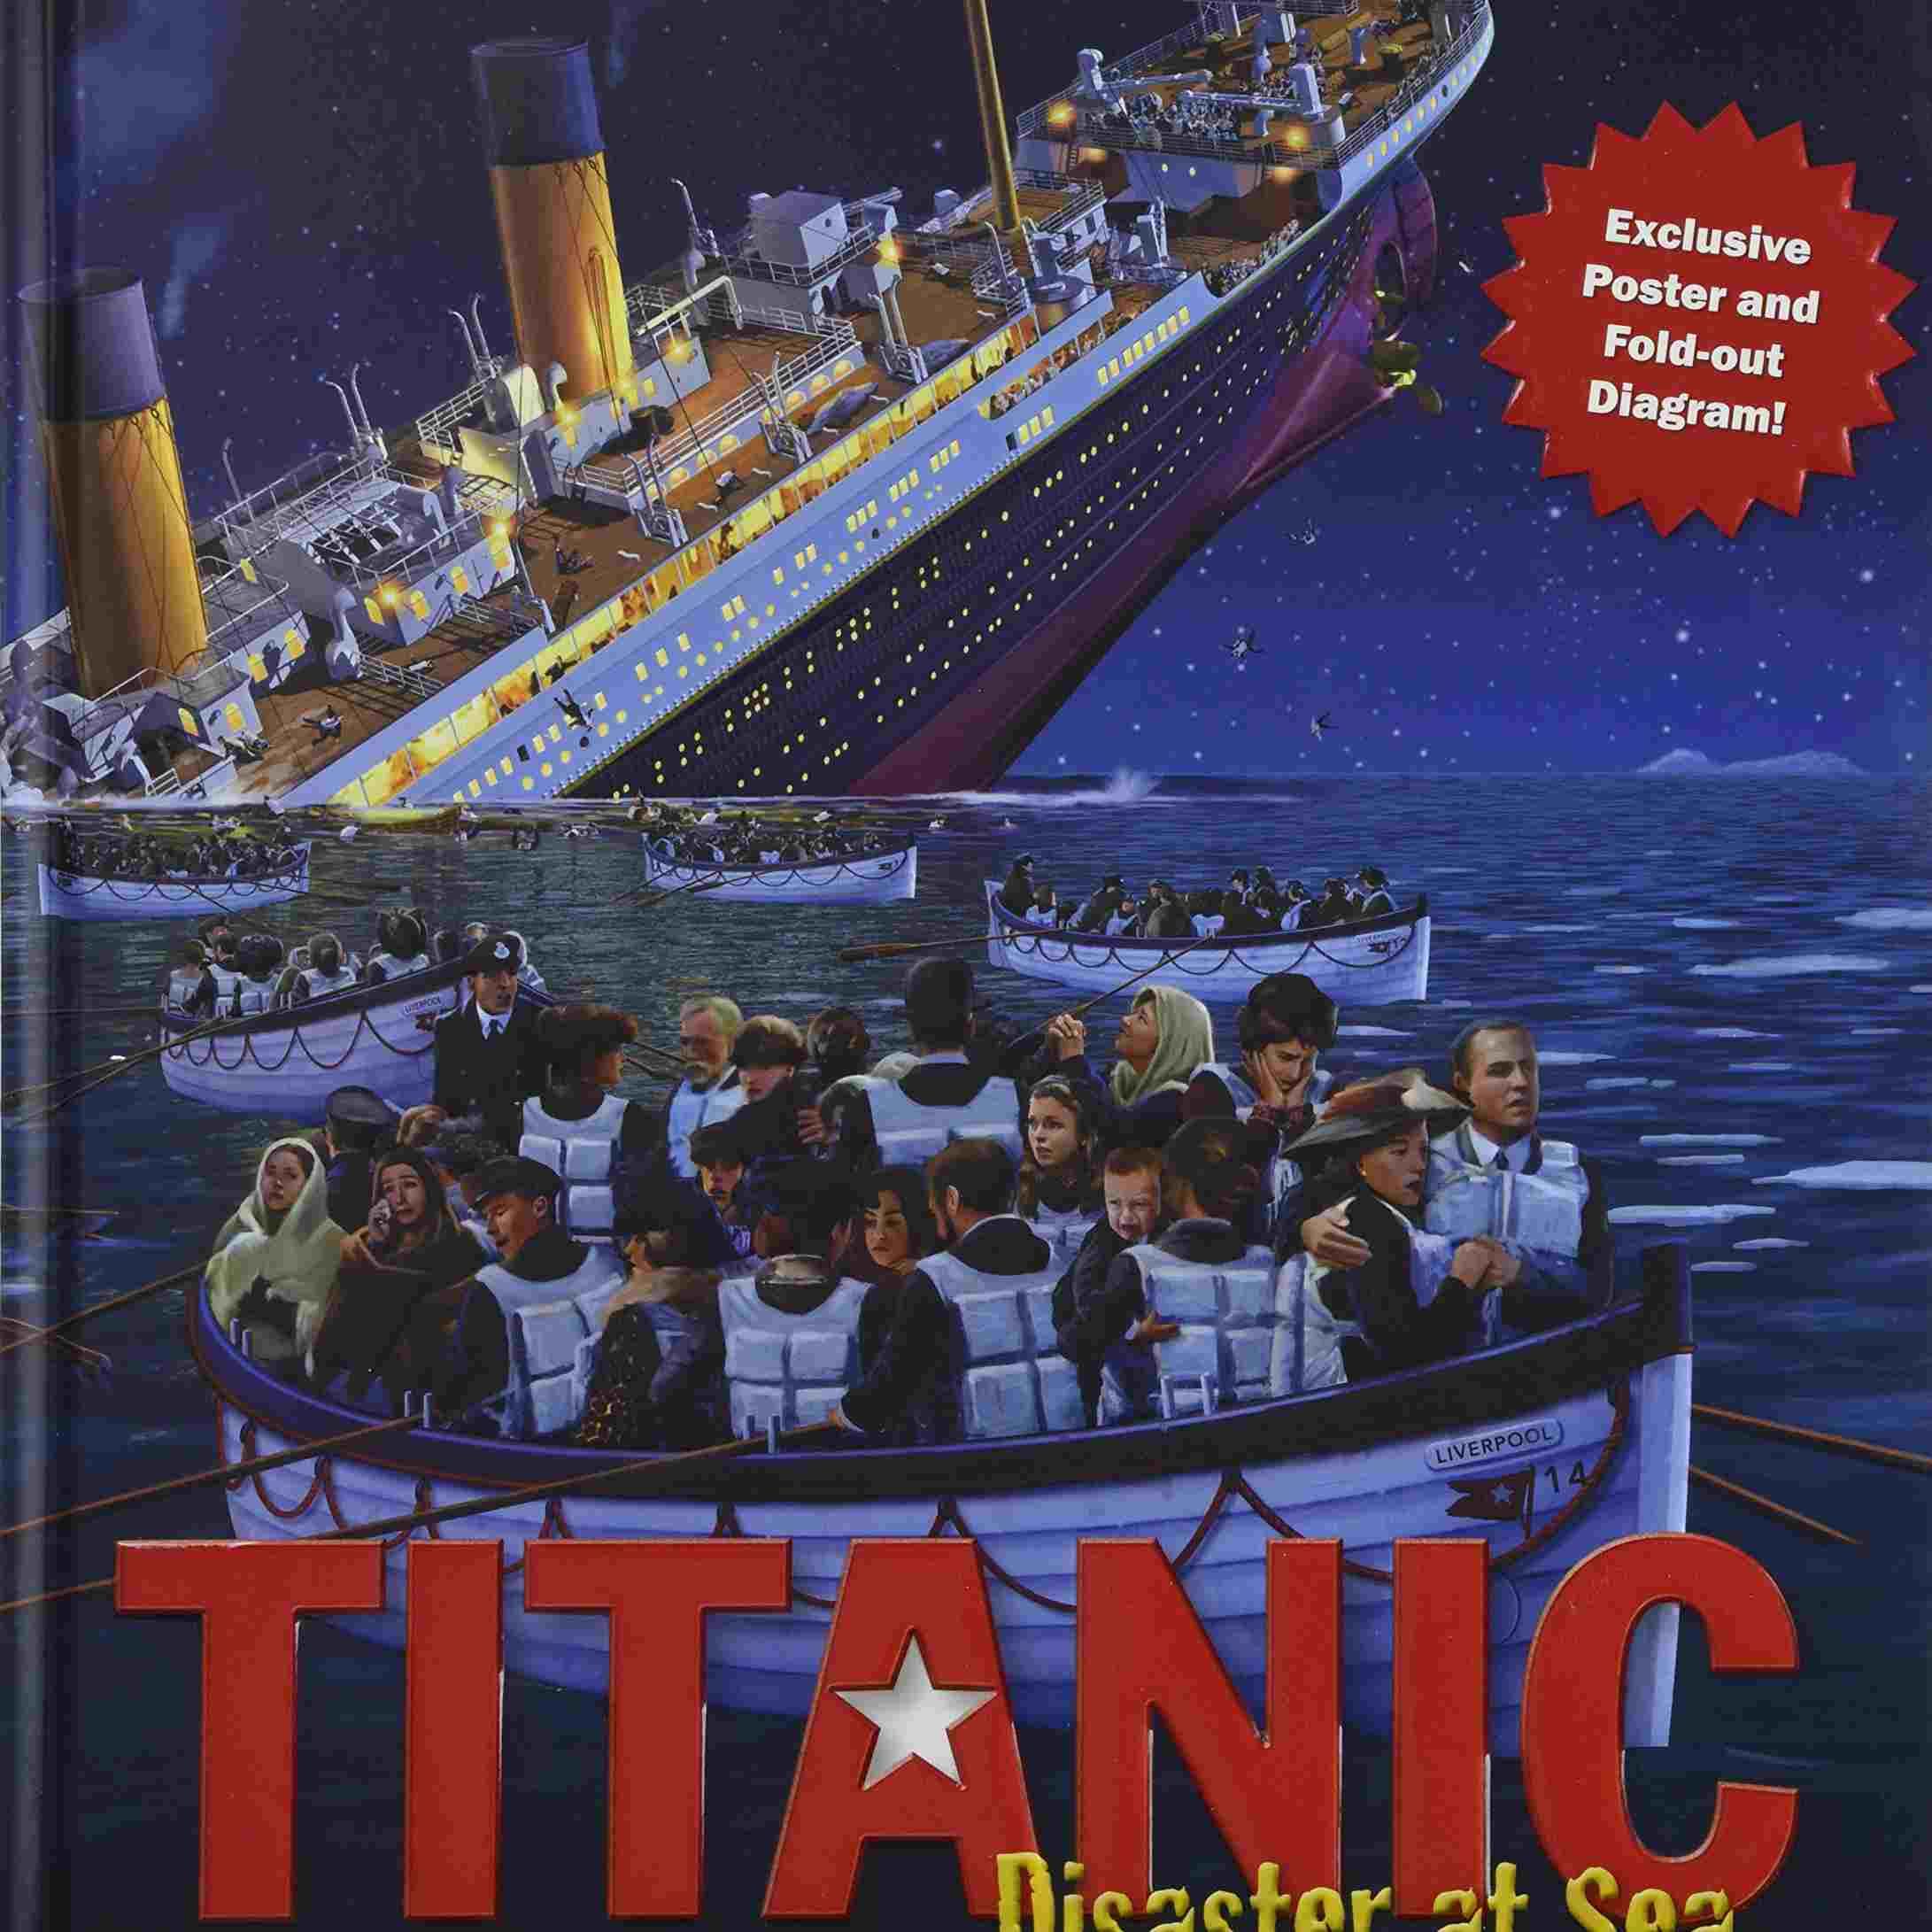 Titanic: Disaster at Sea